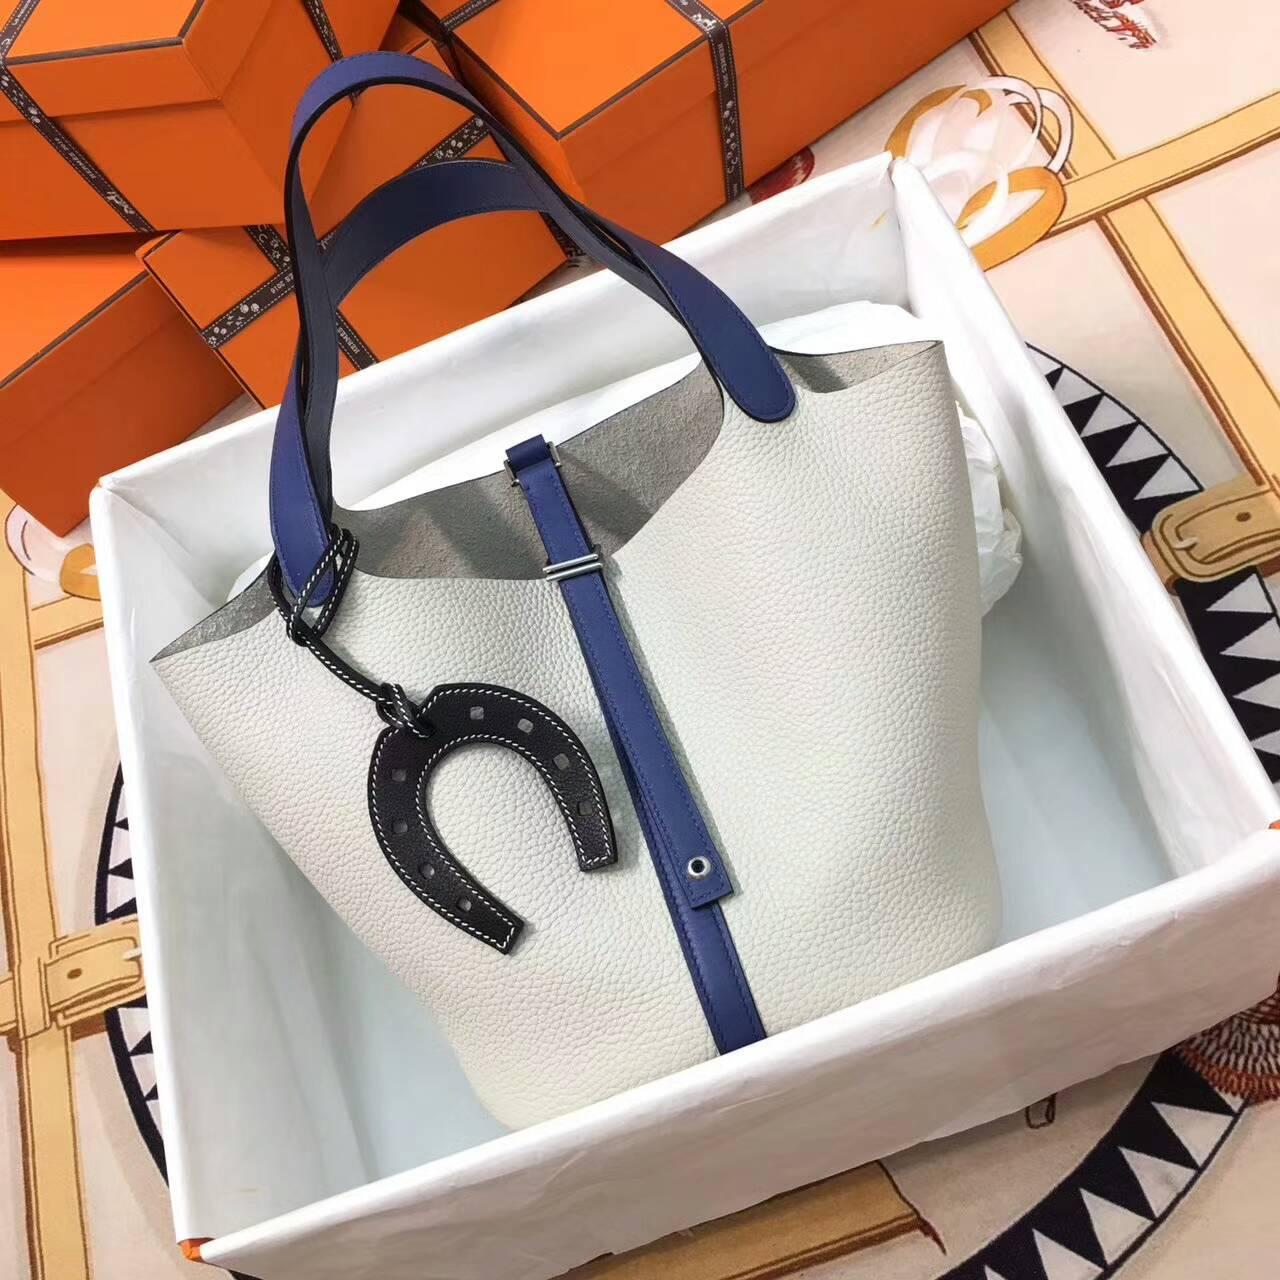 Hermes爱马仕菜篮子 Picotin Lock 22cm Clememce 法国原产Tc皮 80 Gris Perle 珍珠灰拼R2 Blue Agate 玛瑙蓝 银扣